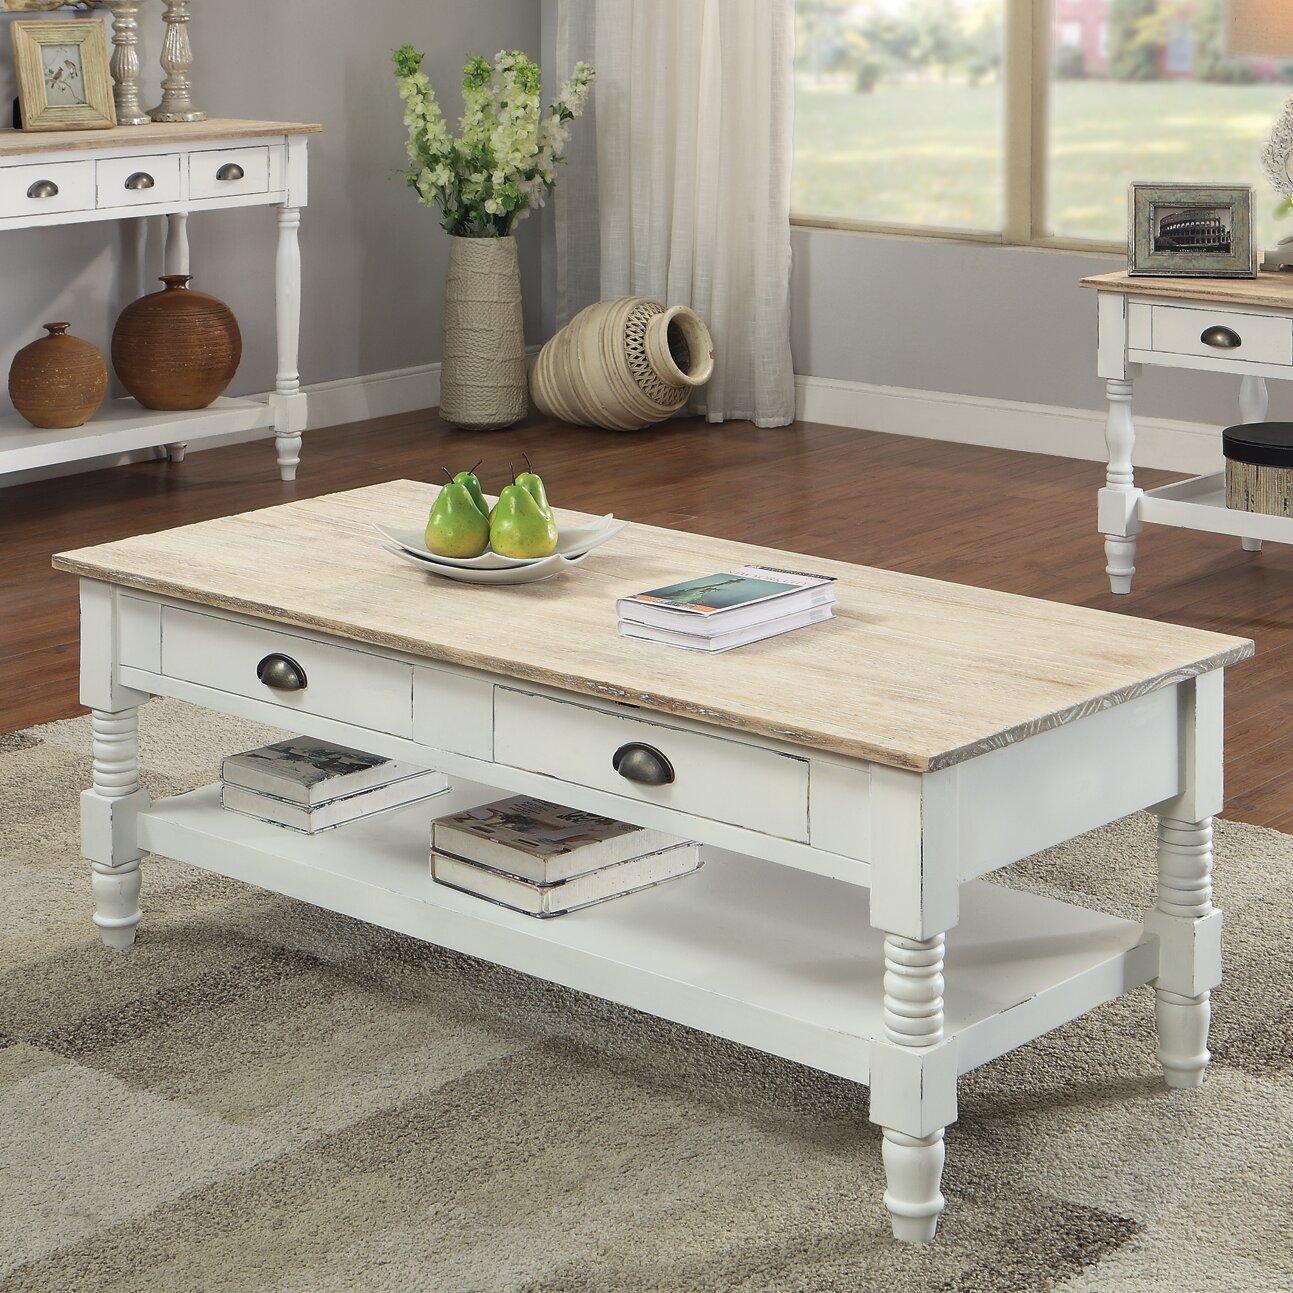 august grove abby ann coffee table reviews wayfair. Black Bedroom Furniture Sets. Home Design Ideas